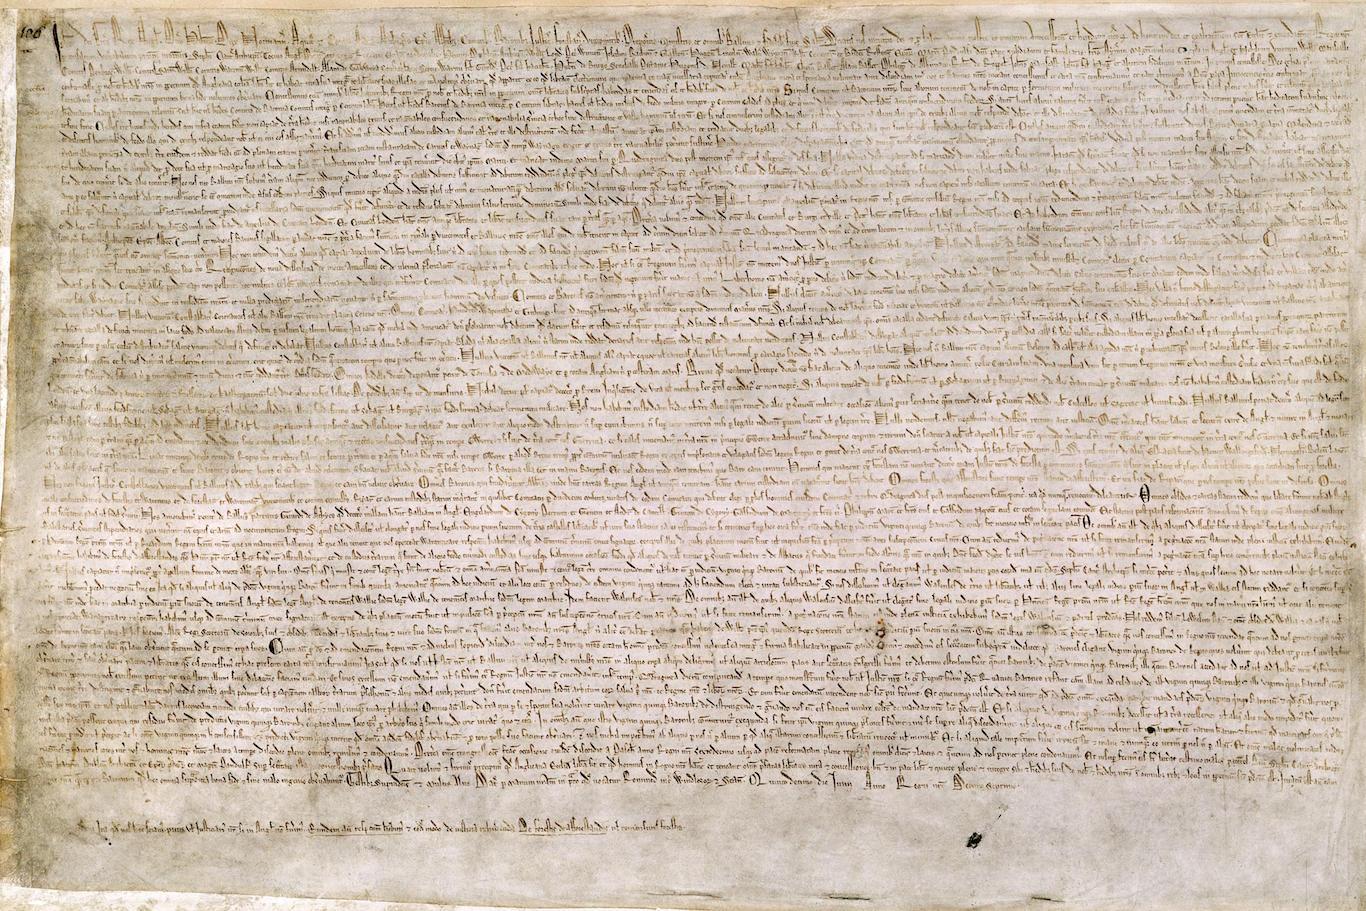 Newsela - Magna Carta has something for everyone